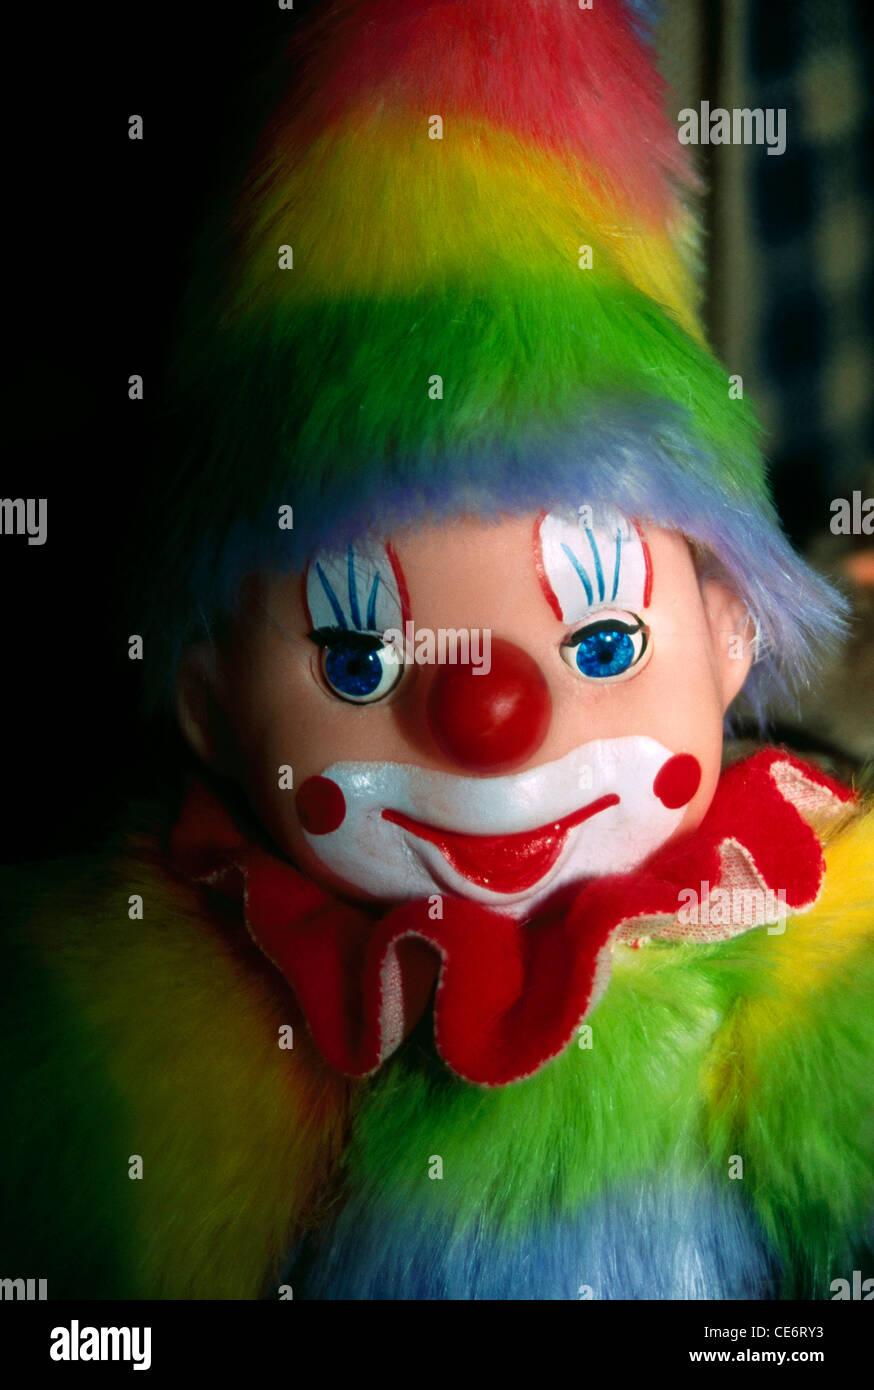 DBA 85071 : joker clown doll toy handicraft large eyes huge red nose big lips india - Stock Image